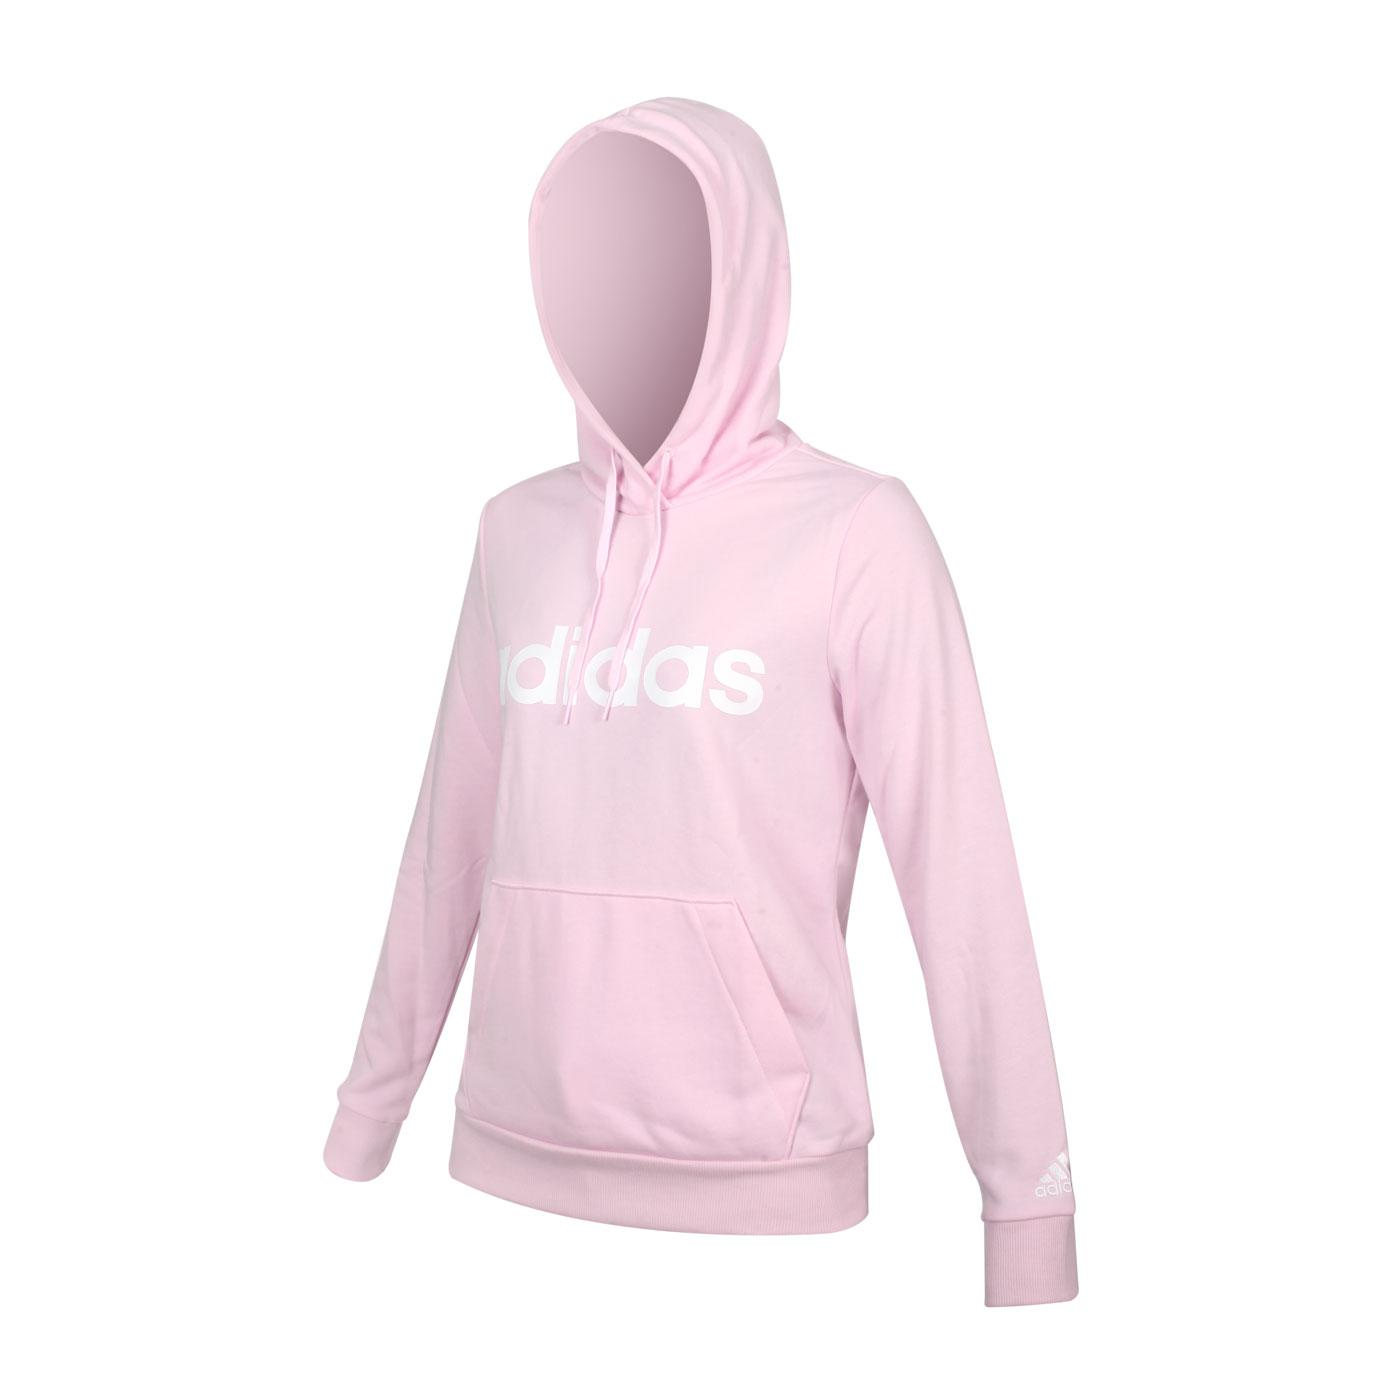 ADIDAS 女款長袖連帽T恤 GL0641 - 粉紅白